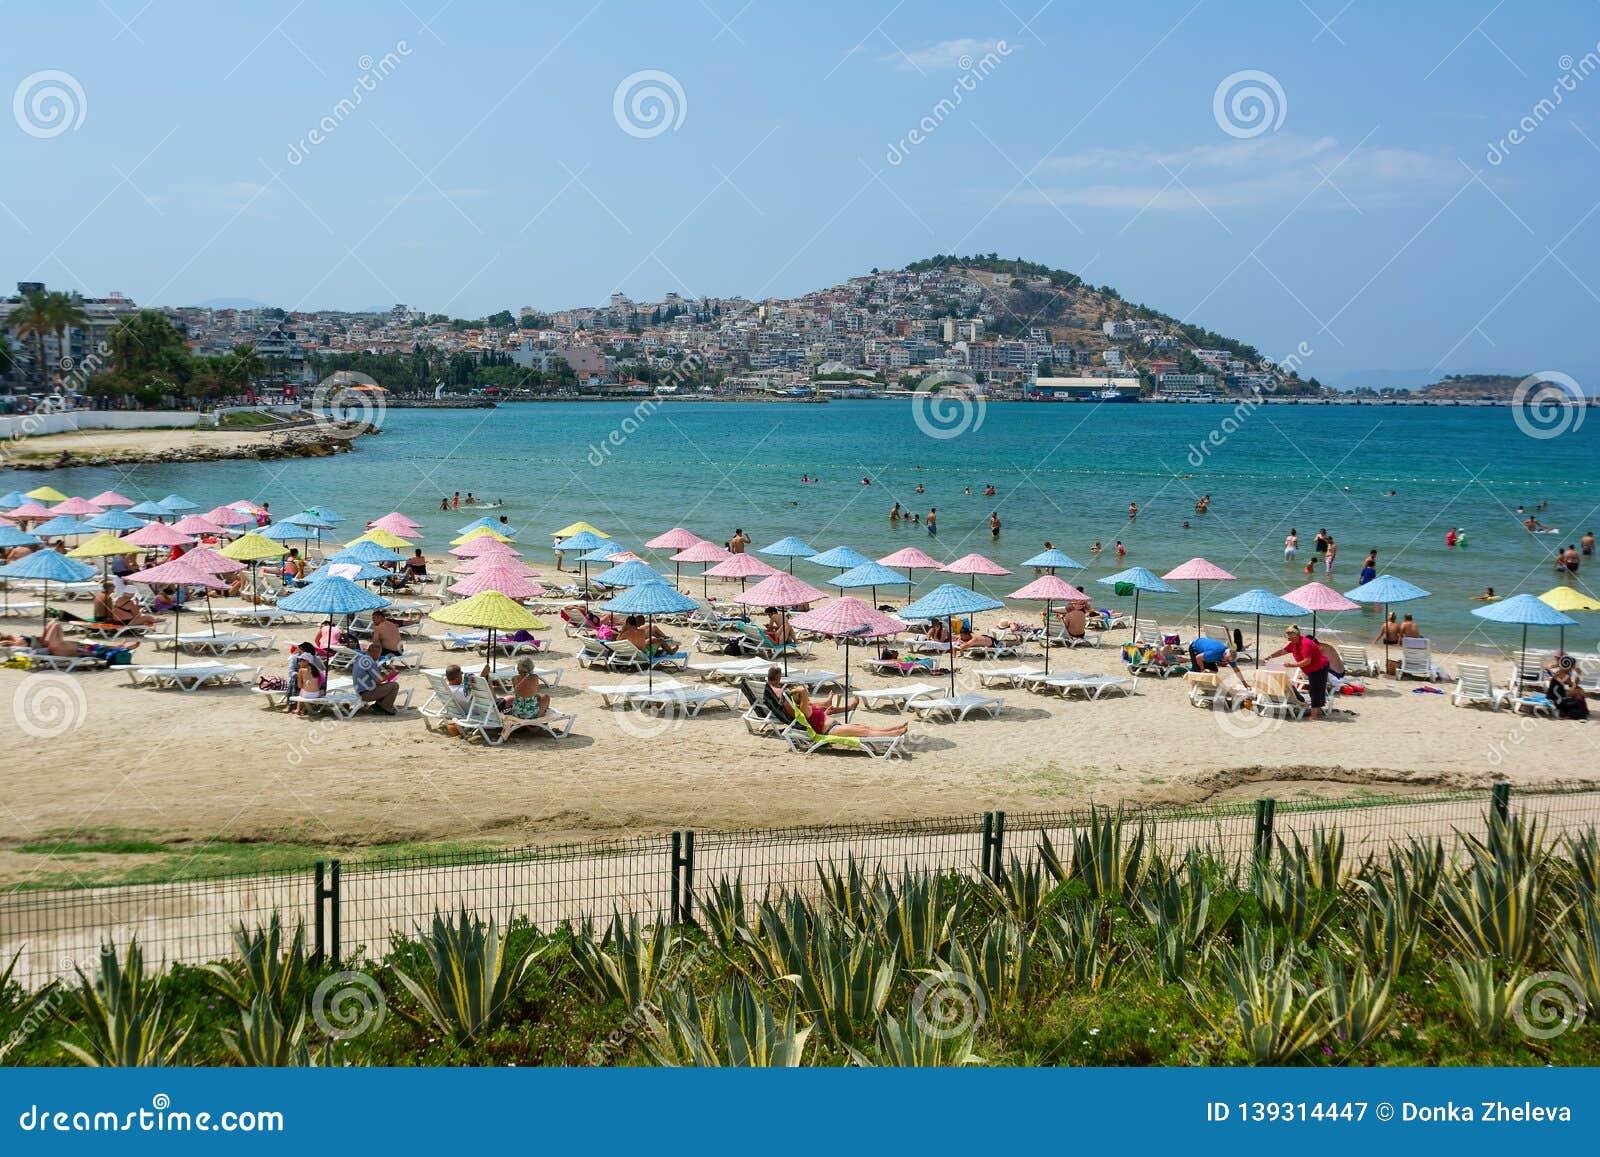 KUSADASI, TURKEY - AUGUST 20, 2017: Beautiful sand beach of Kusadasi with colorful straw umbrellas and lounge chairs, Aegean Sea